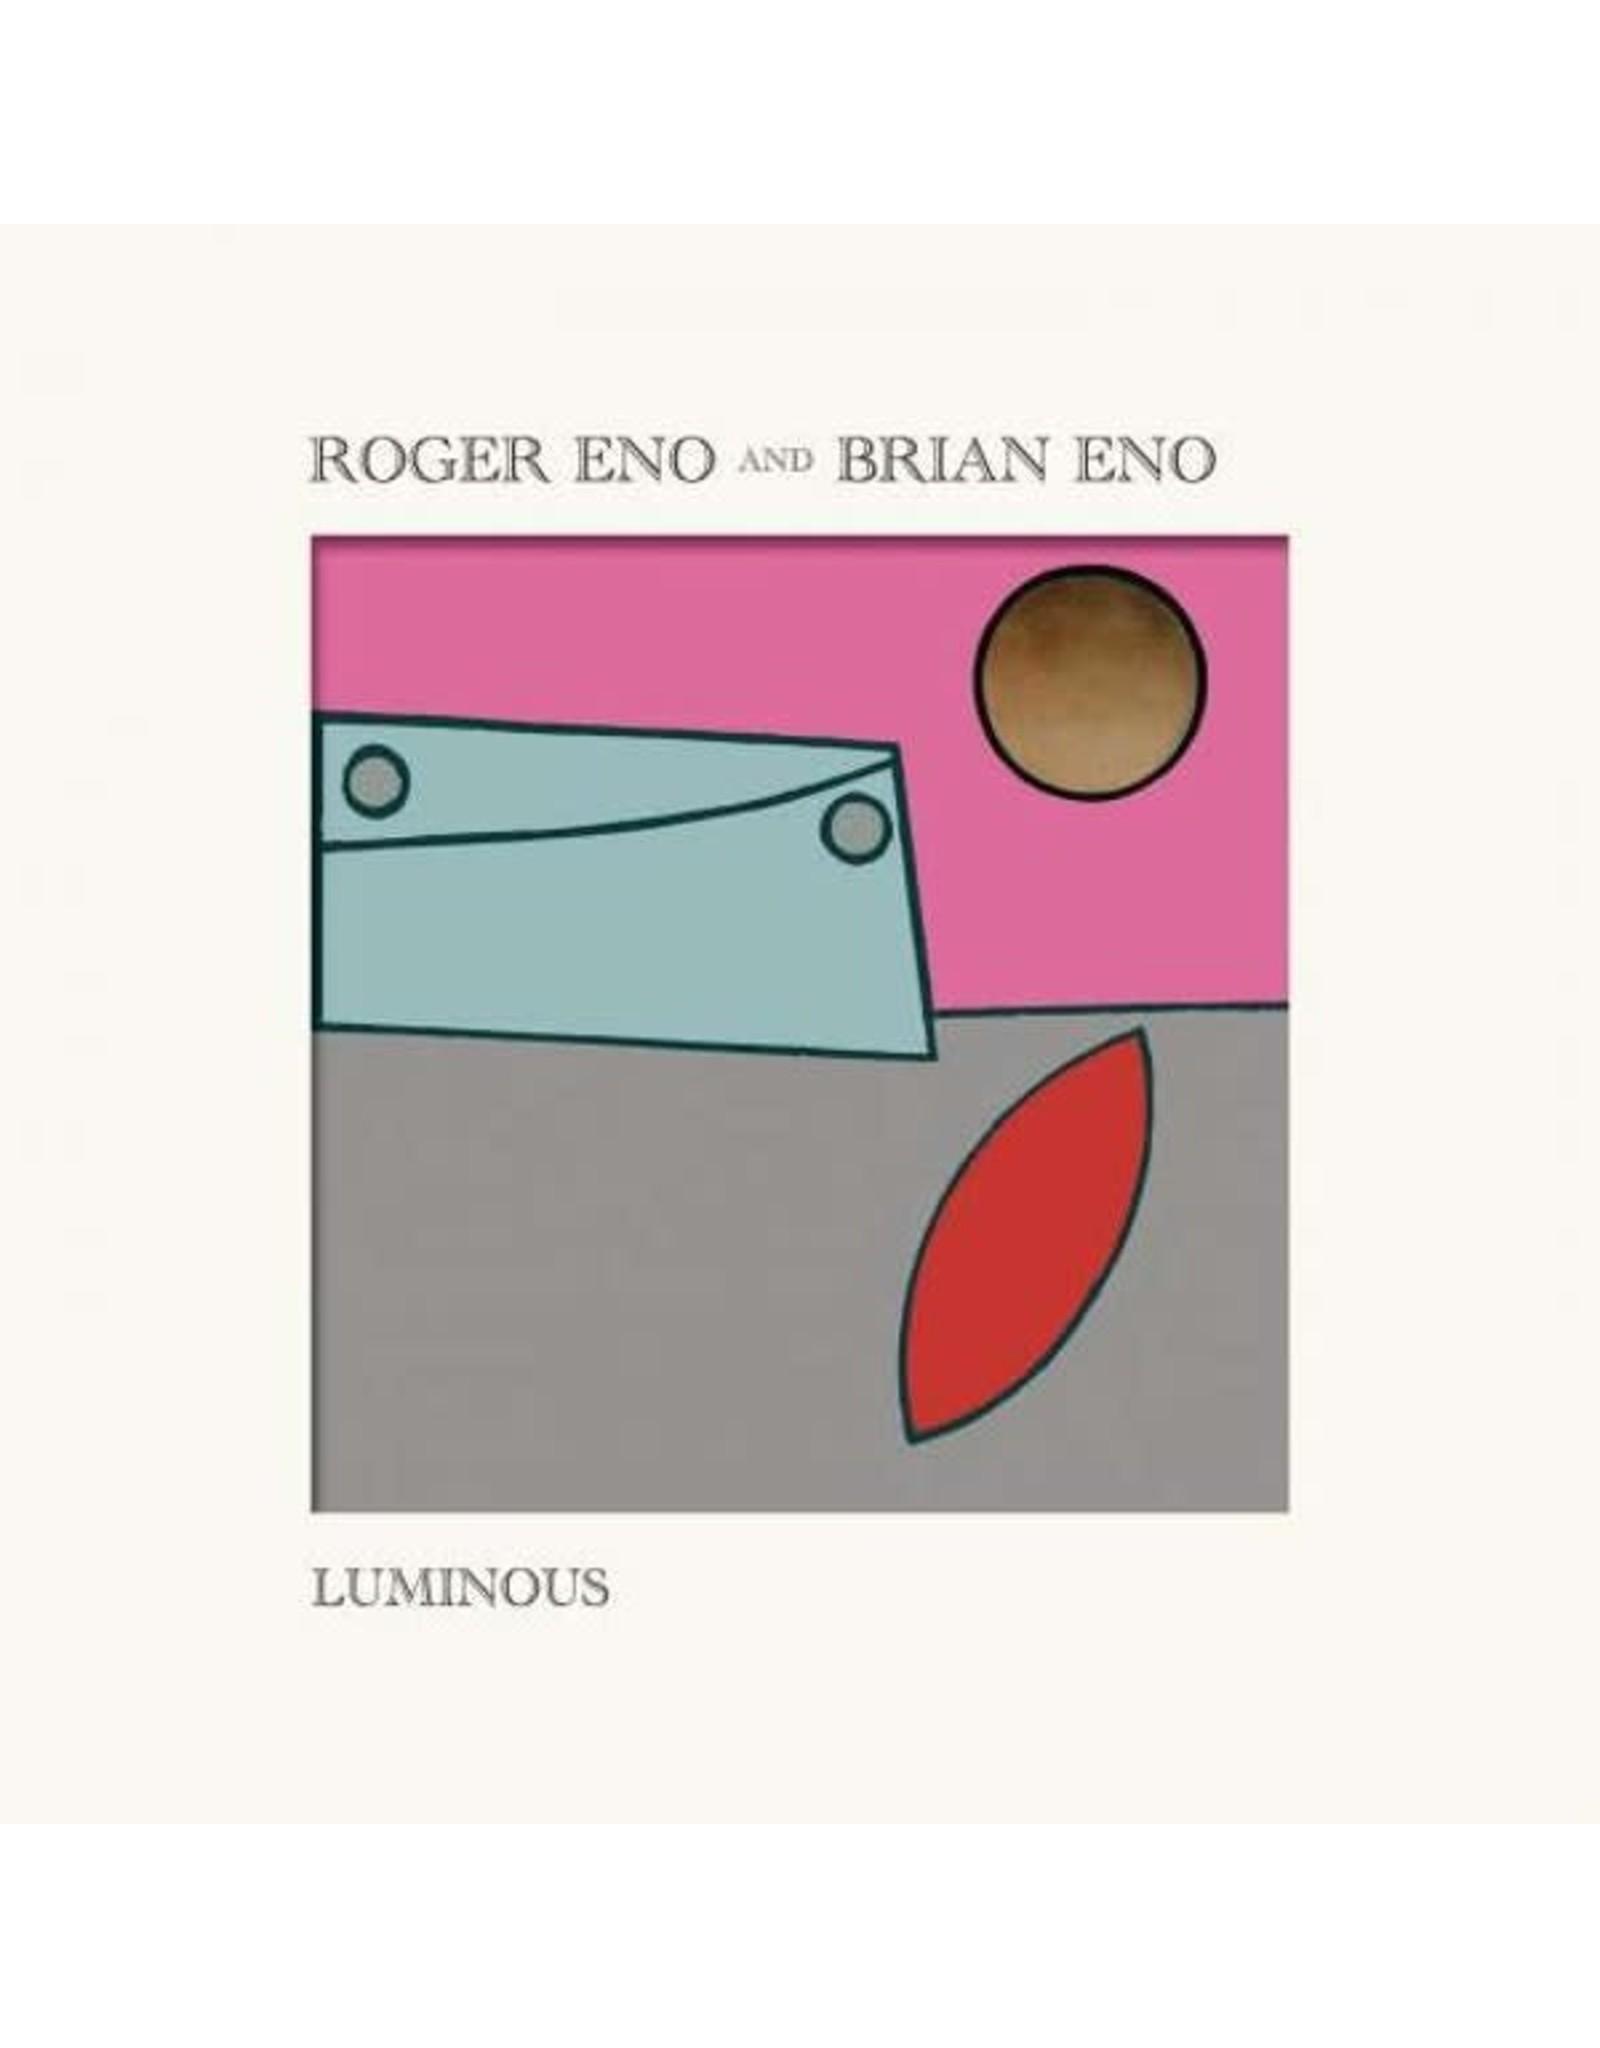 Eno, Roger/Brian - Luminous LP